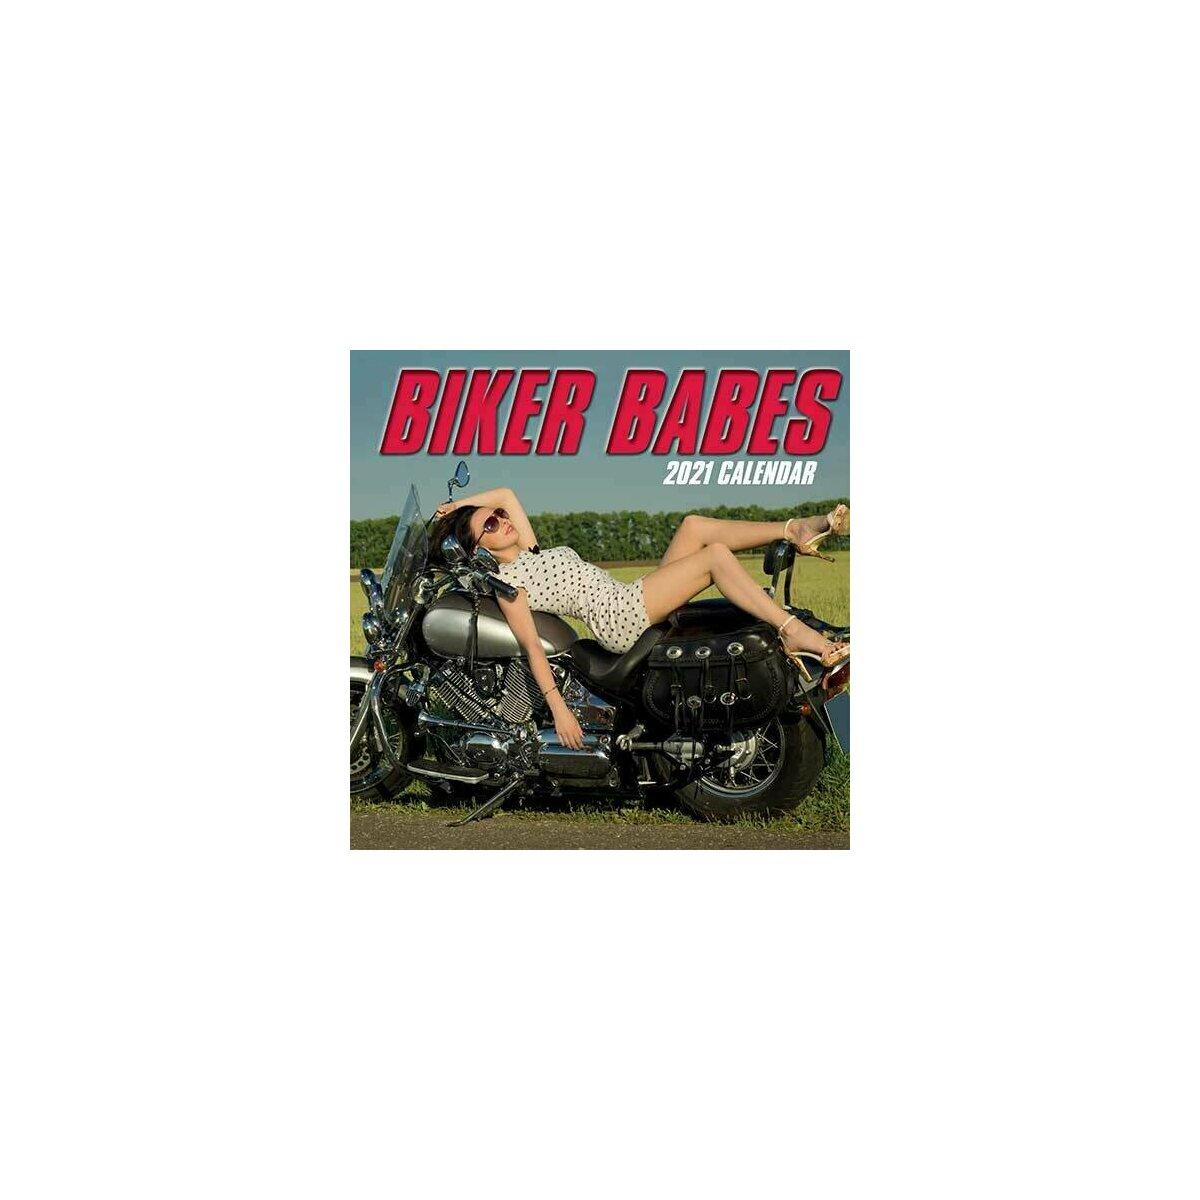 Calendrier 2021 Hot Femme Calendrier 2021 Sexy femme et moto